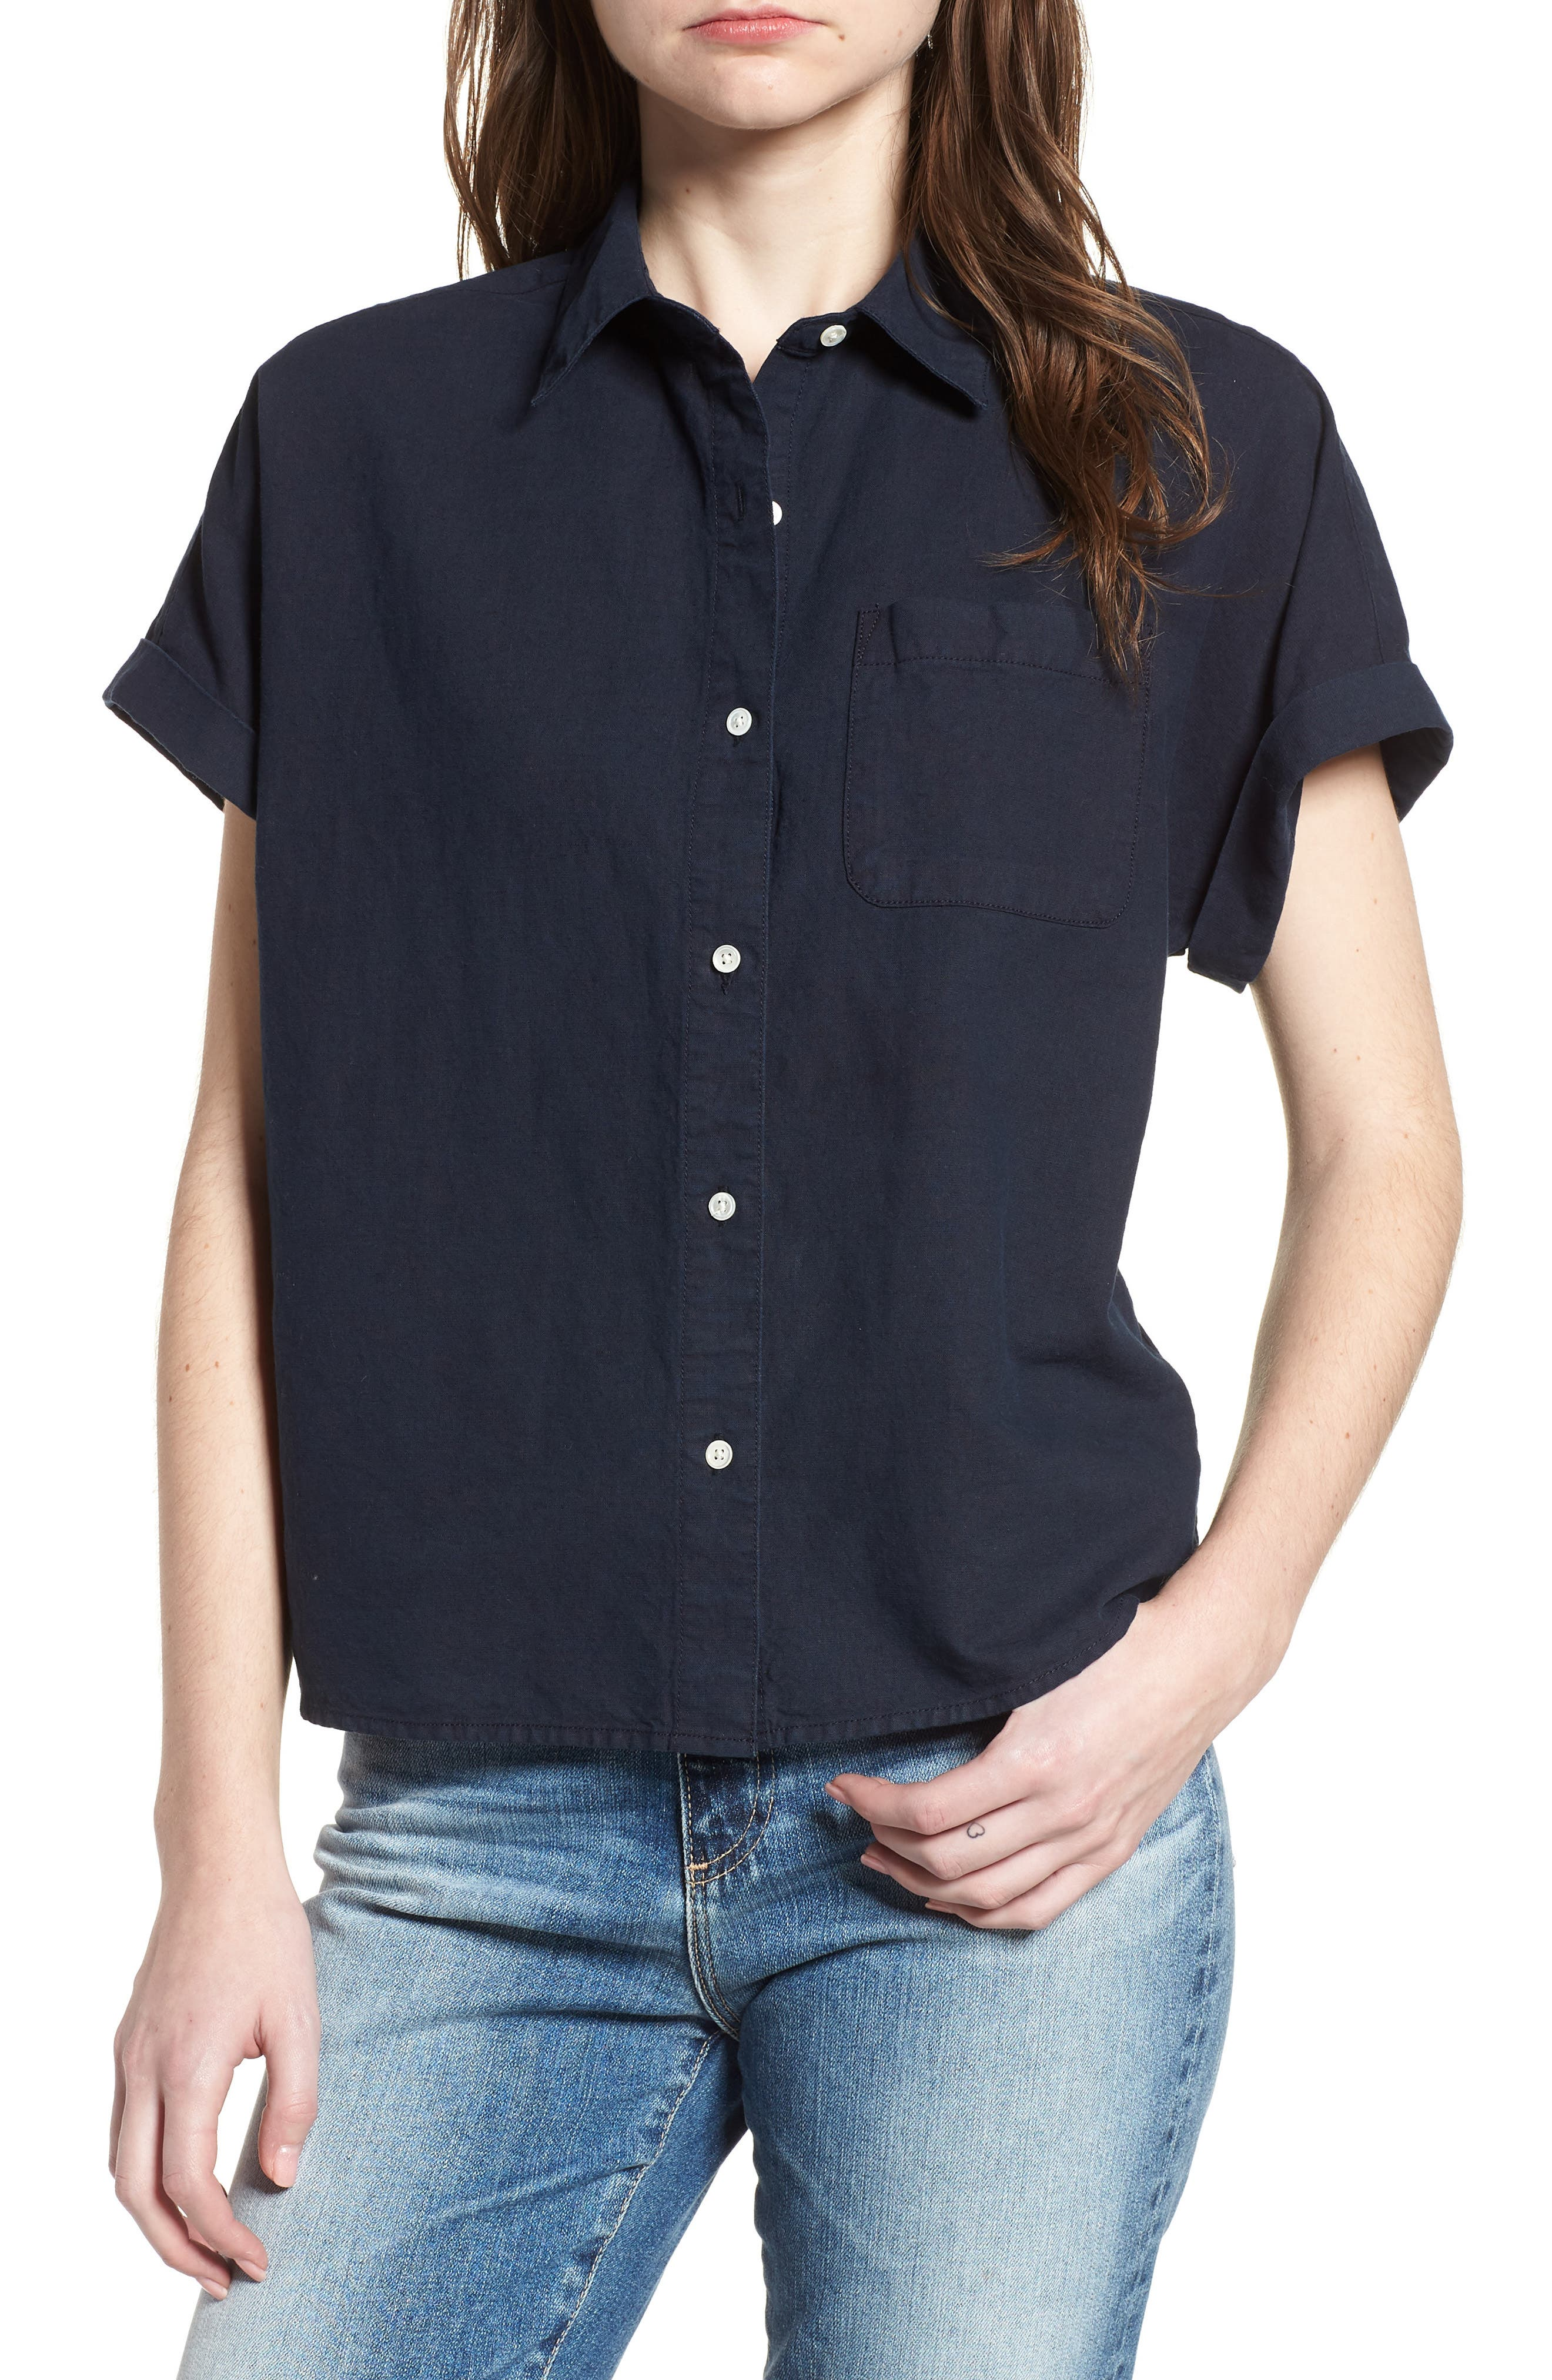 Hadley Shirt,                         Main,                         color, SULFUR DARK COVE